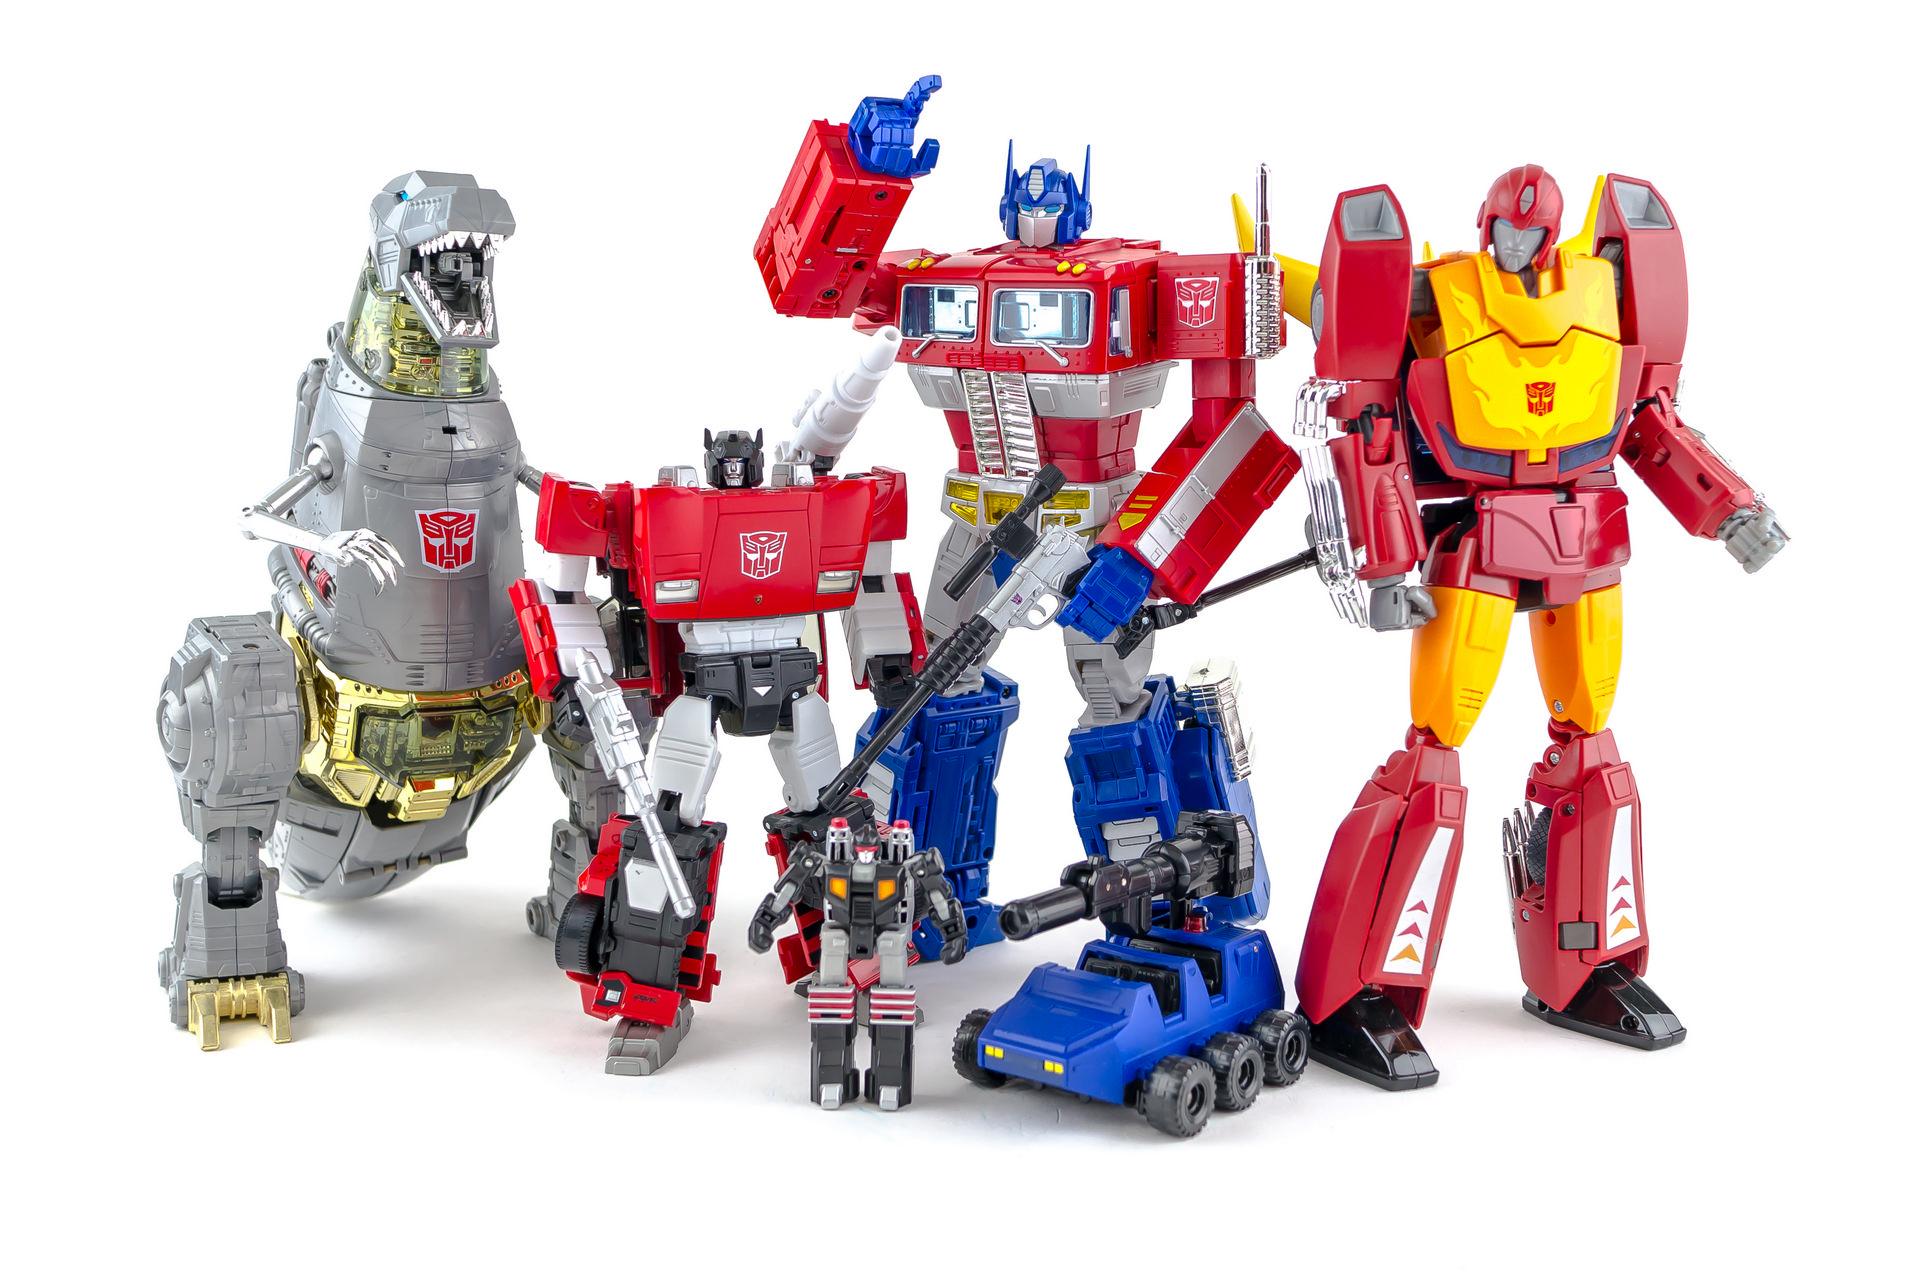 Toys From Hasbro : Hasbro to produce d printed toys